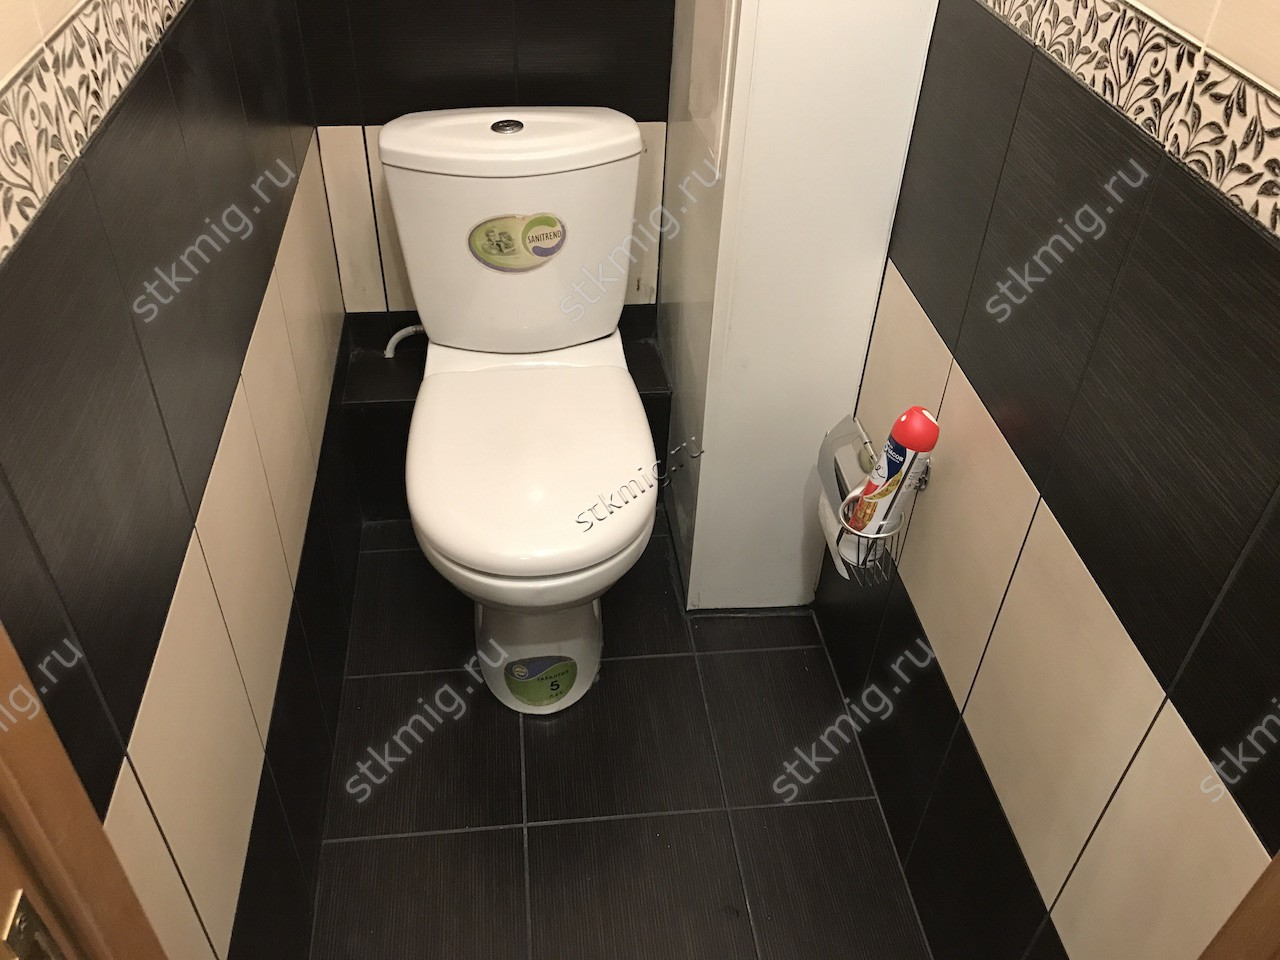 Идея для туалета 1 кв.м фото